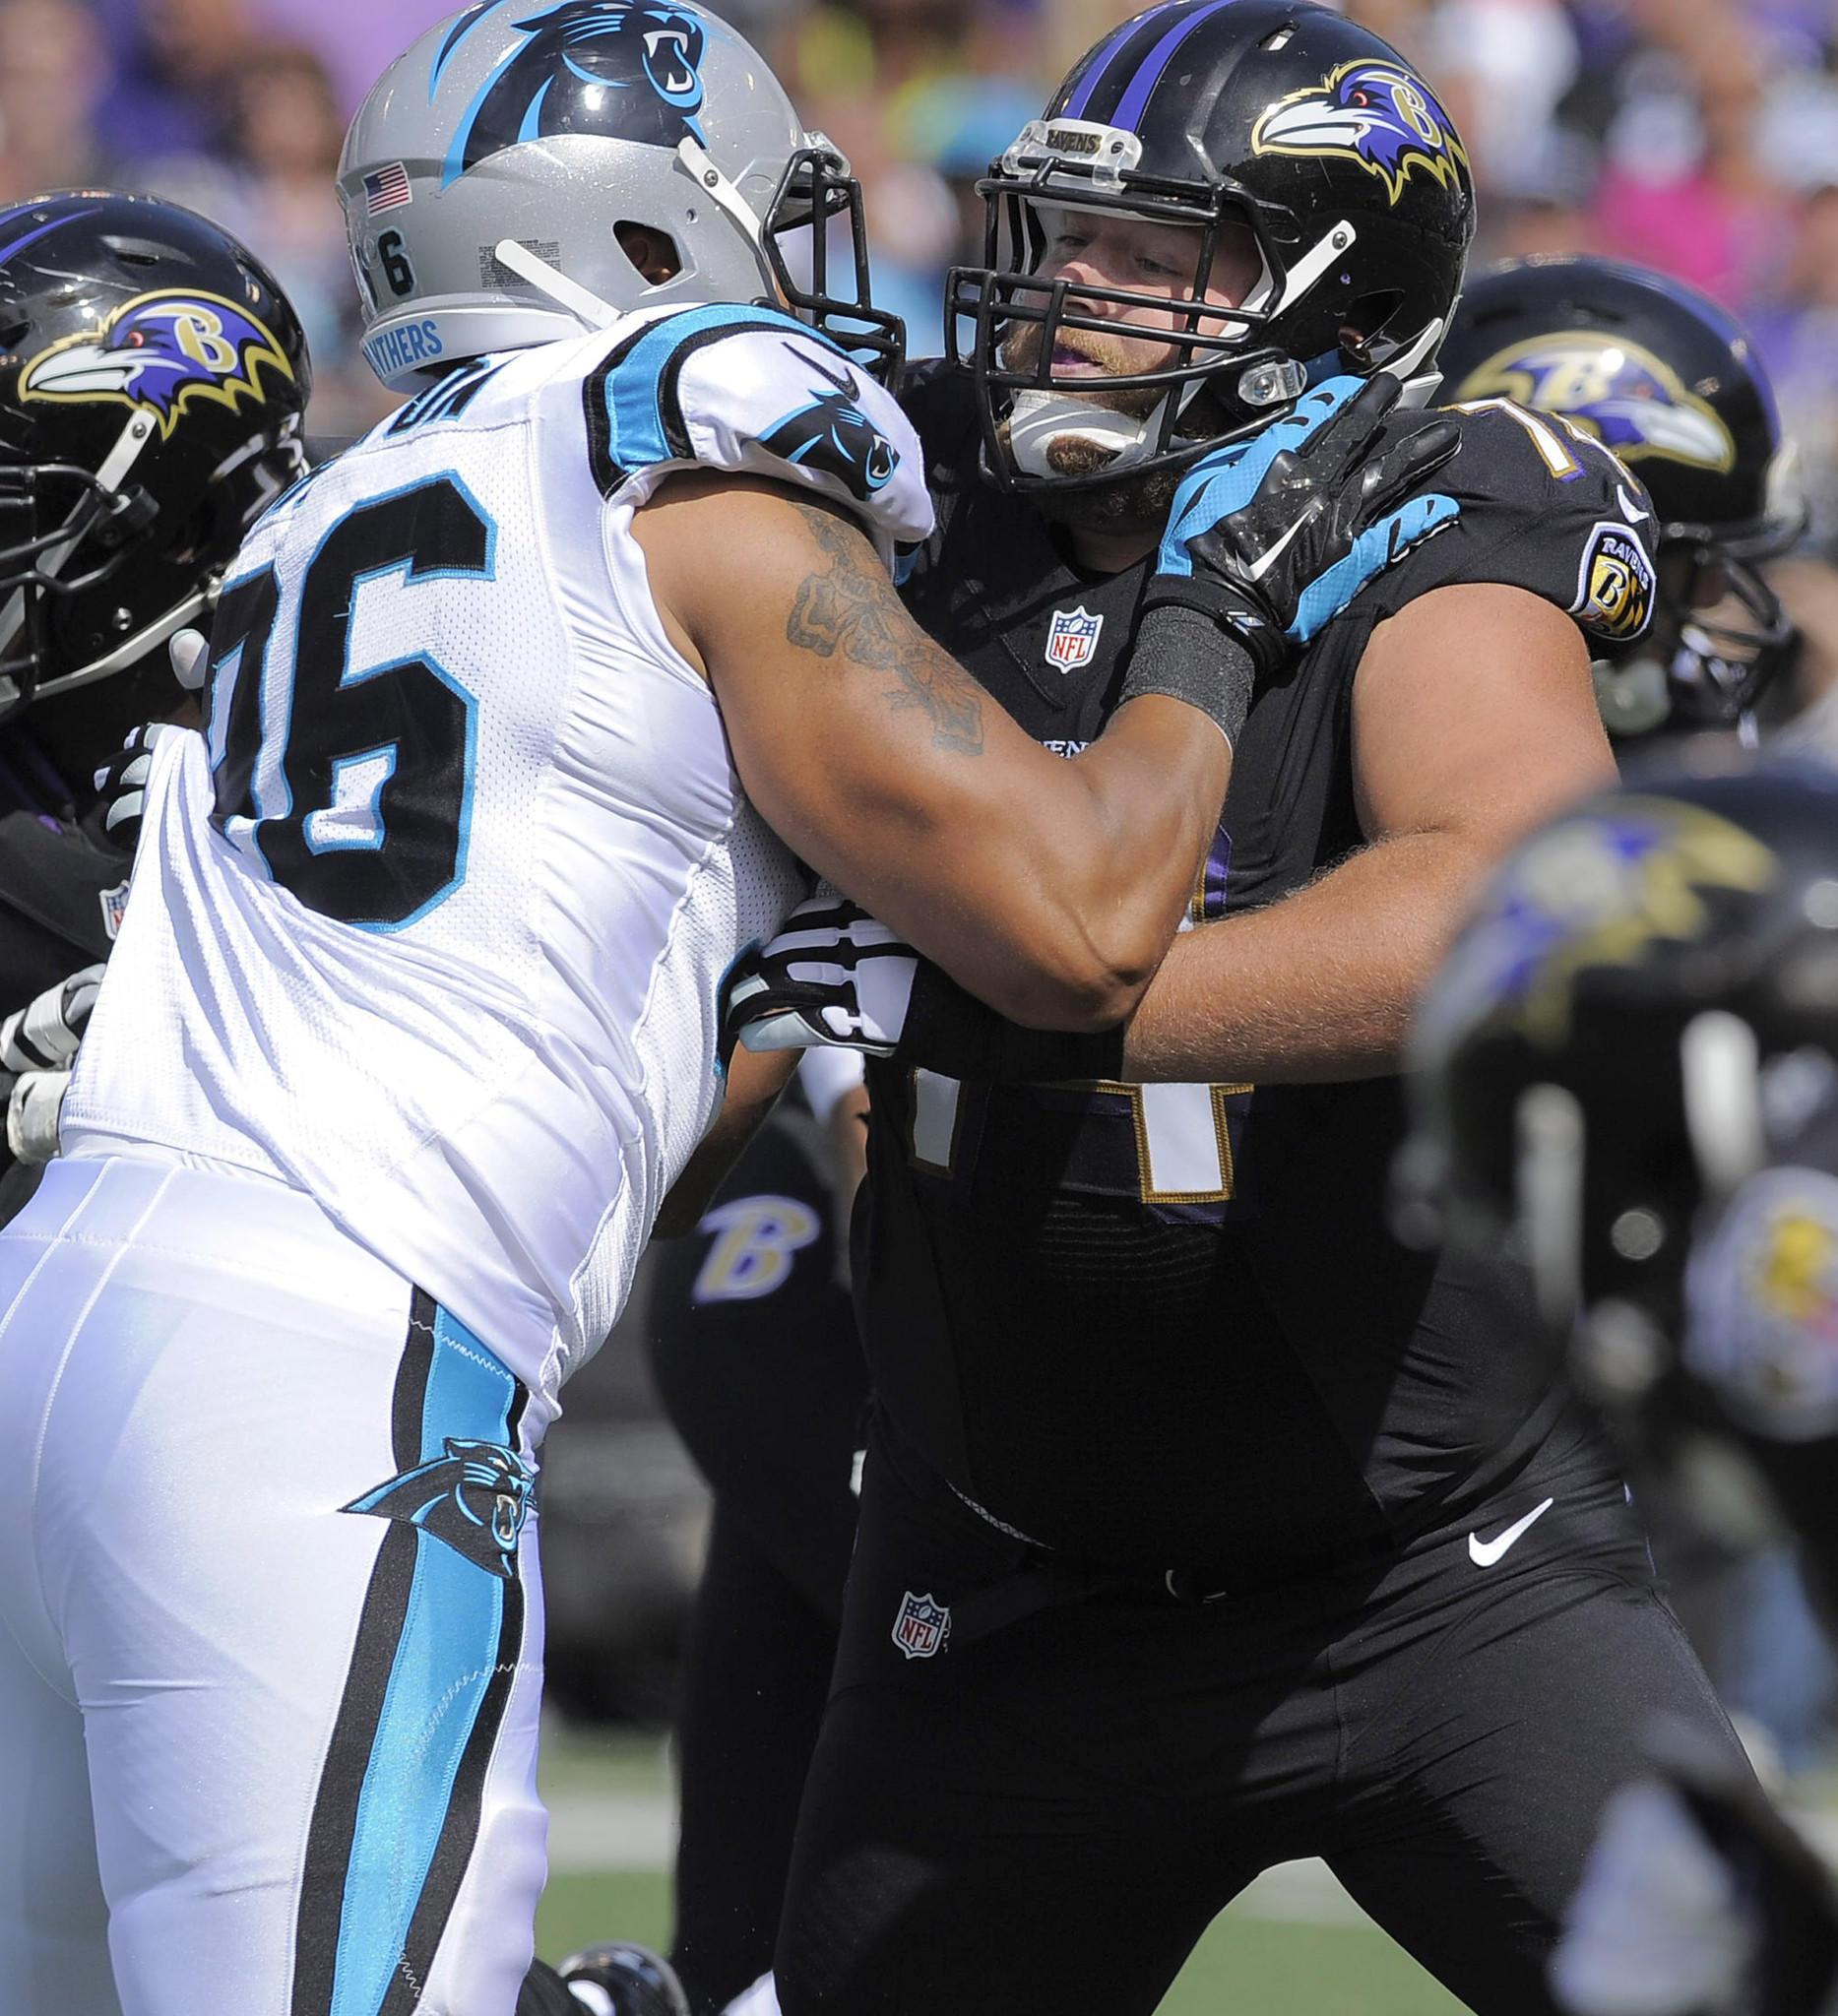 Ravens left tackle James Hurst blocks in the first quarter against the Carolina Panthers at M&T Bank Stadium.